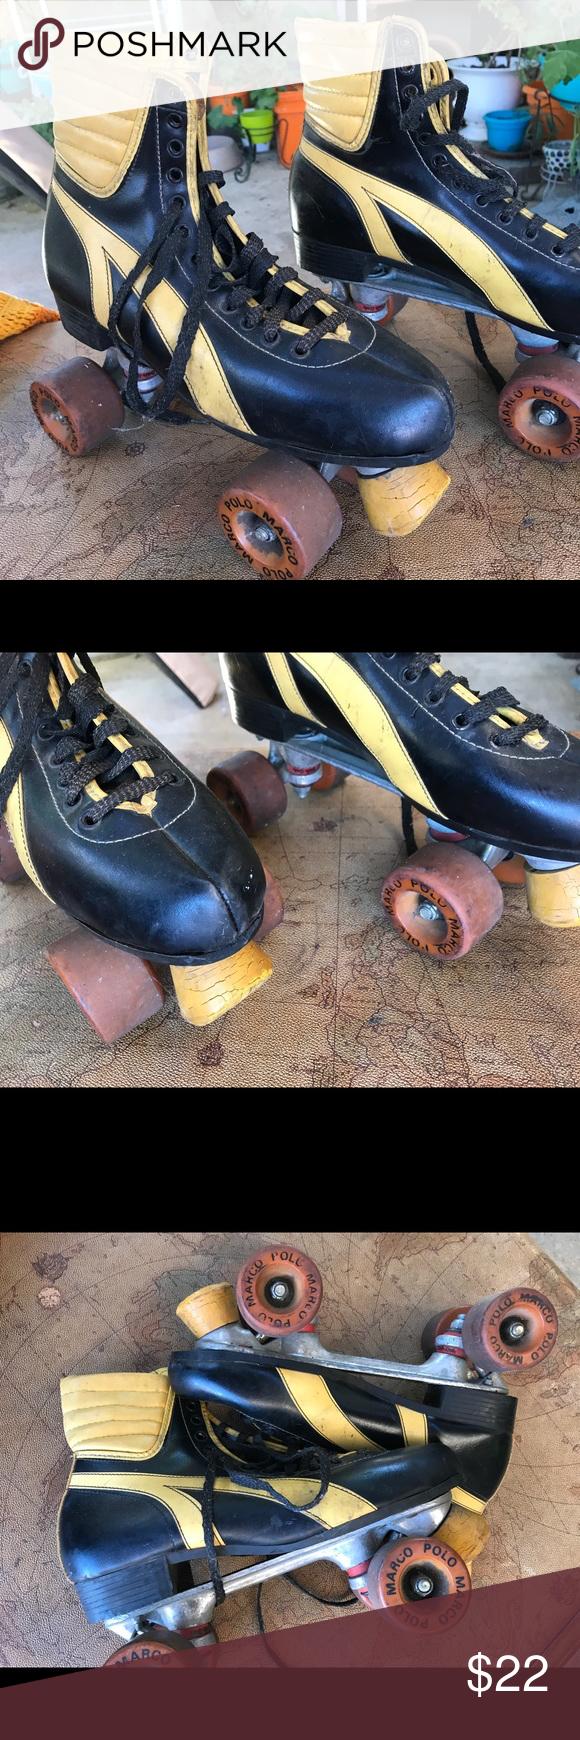 Vintage men's size 11 Marco polo Rollerskates Men's size